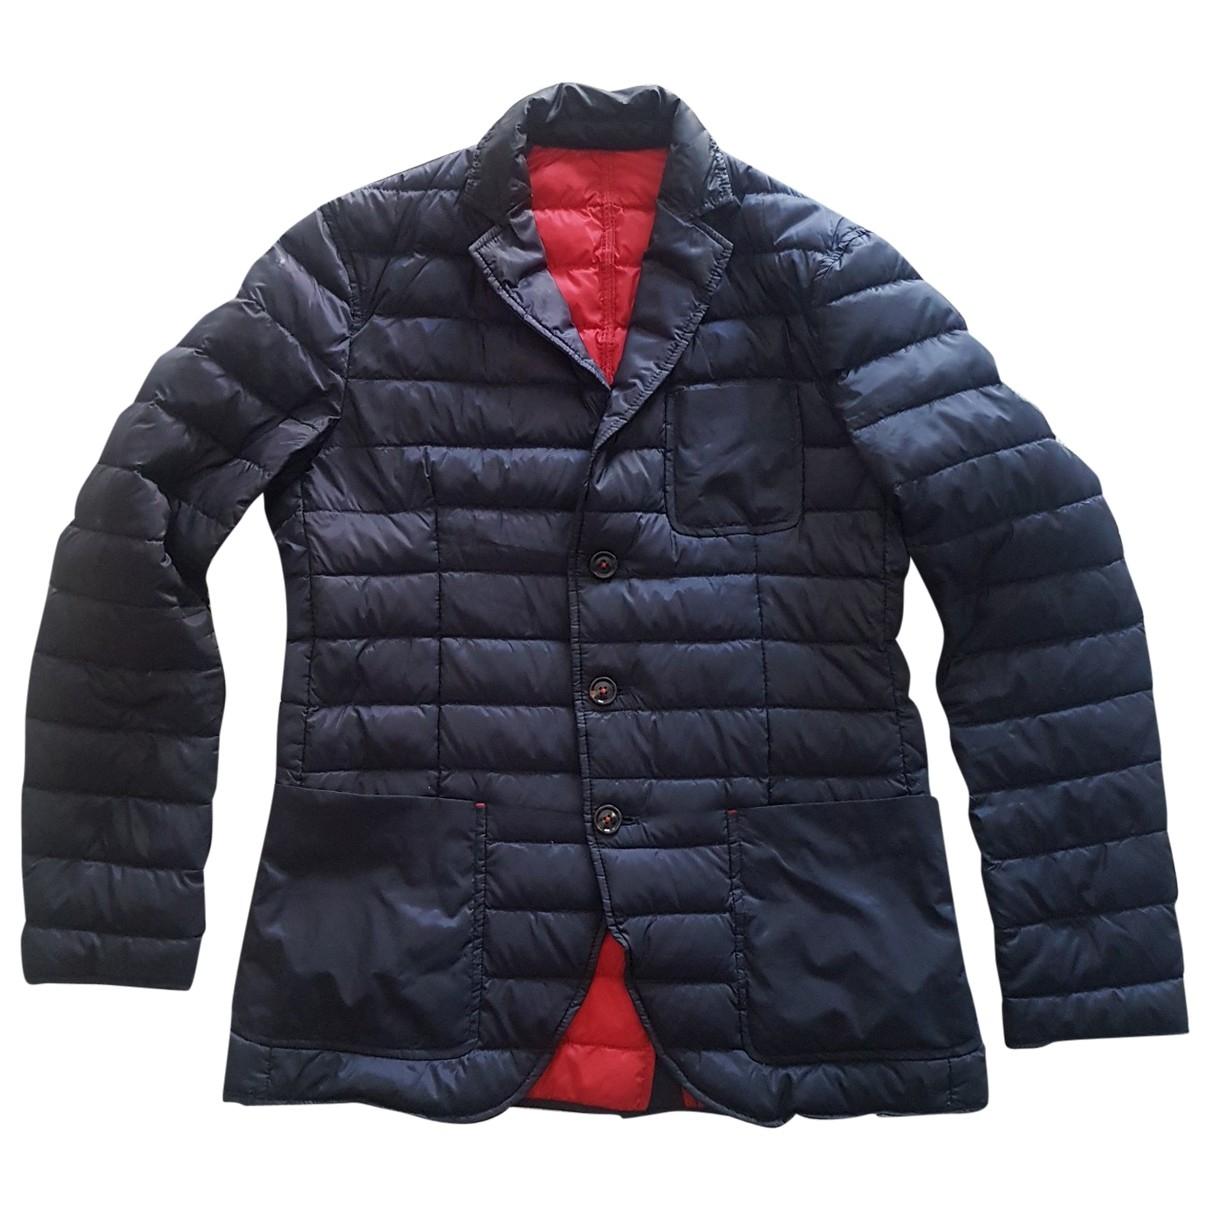 Carolina Herrera \N Navy jacket  for Men S International